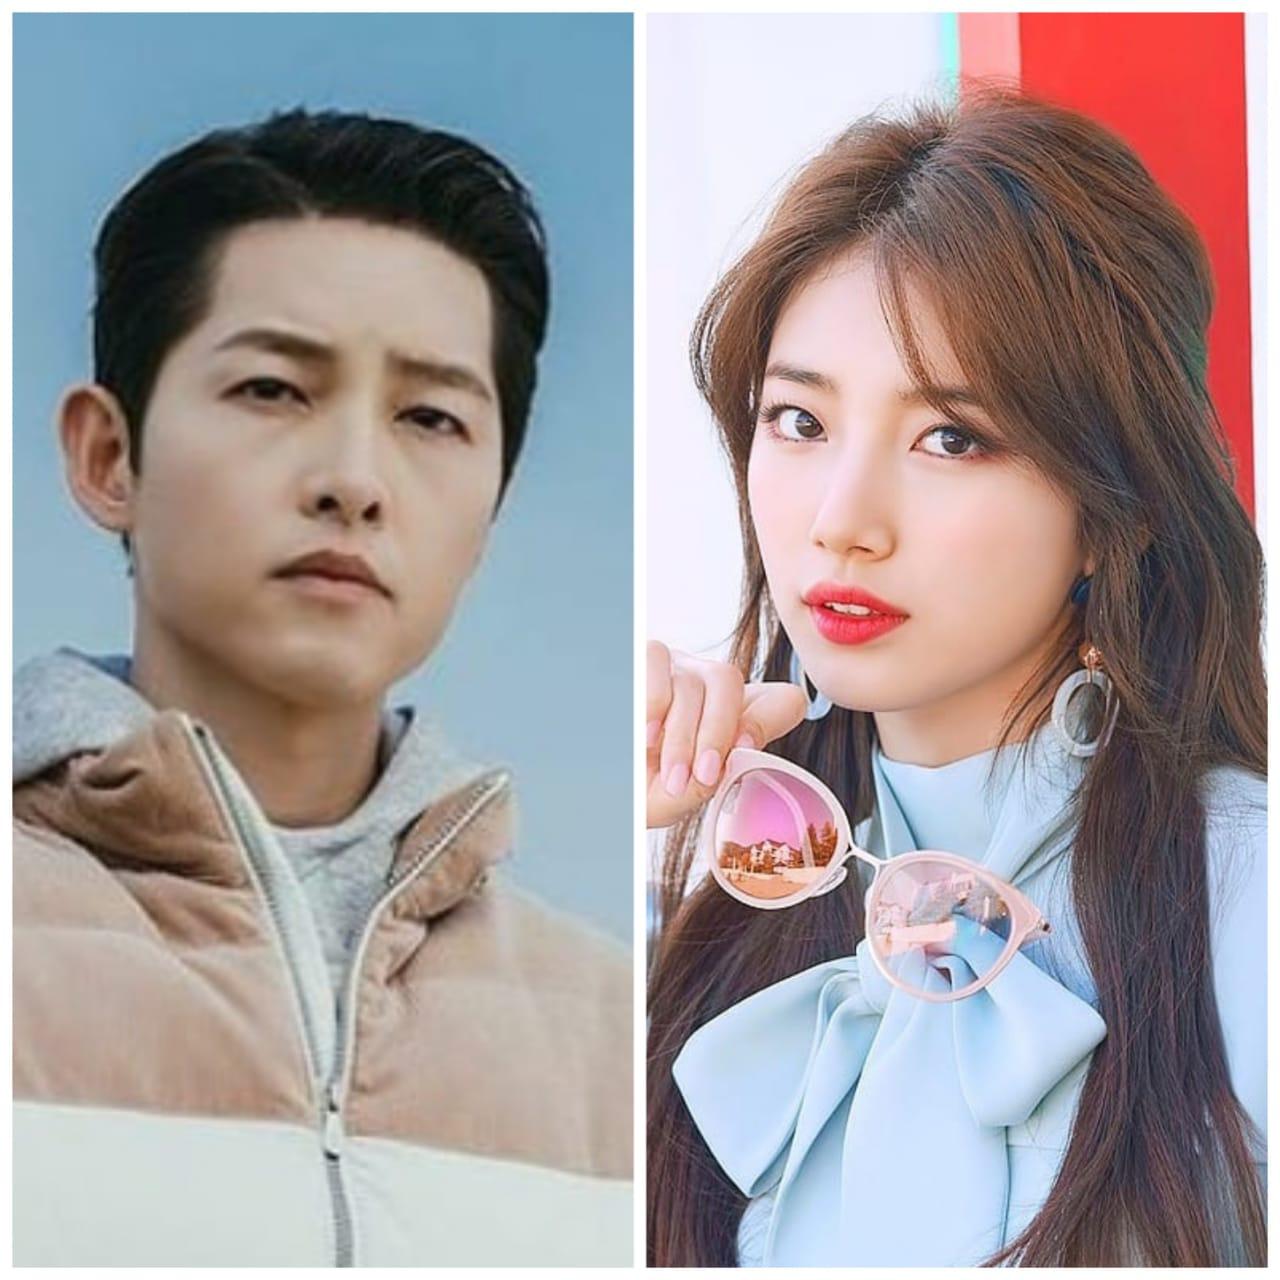 Song Joong Ki Bakal Main Bareng Bae Suzy dalam Drama Terbaru, Benarkah?